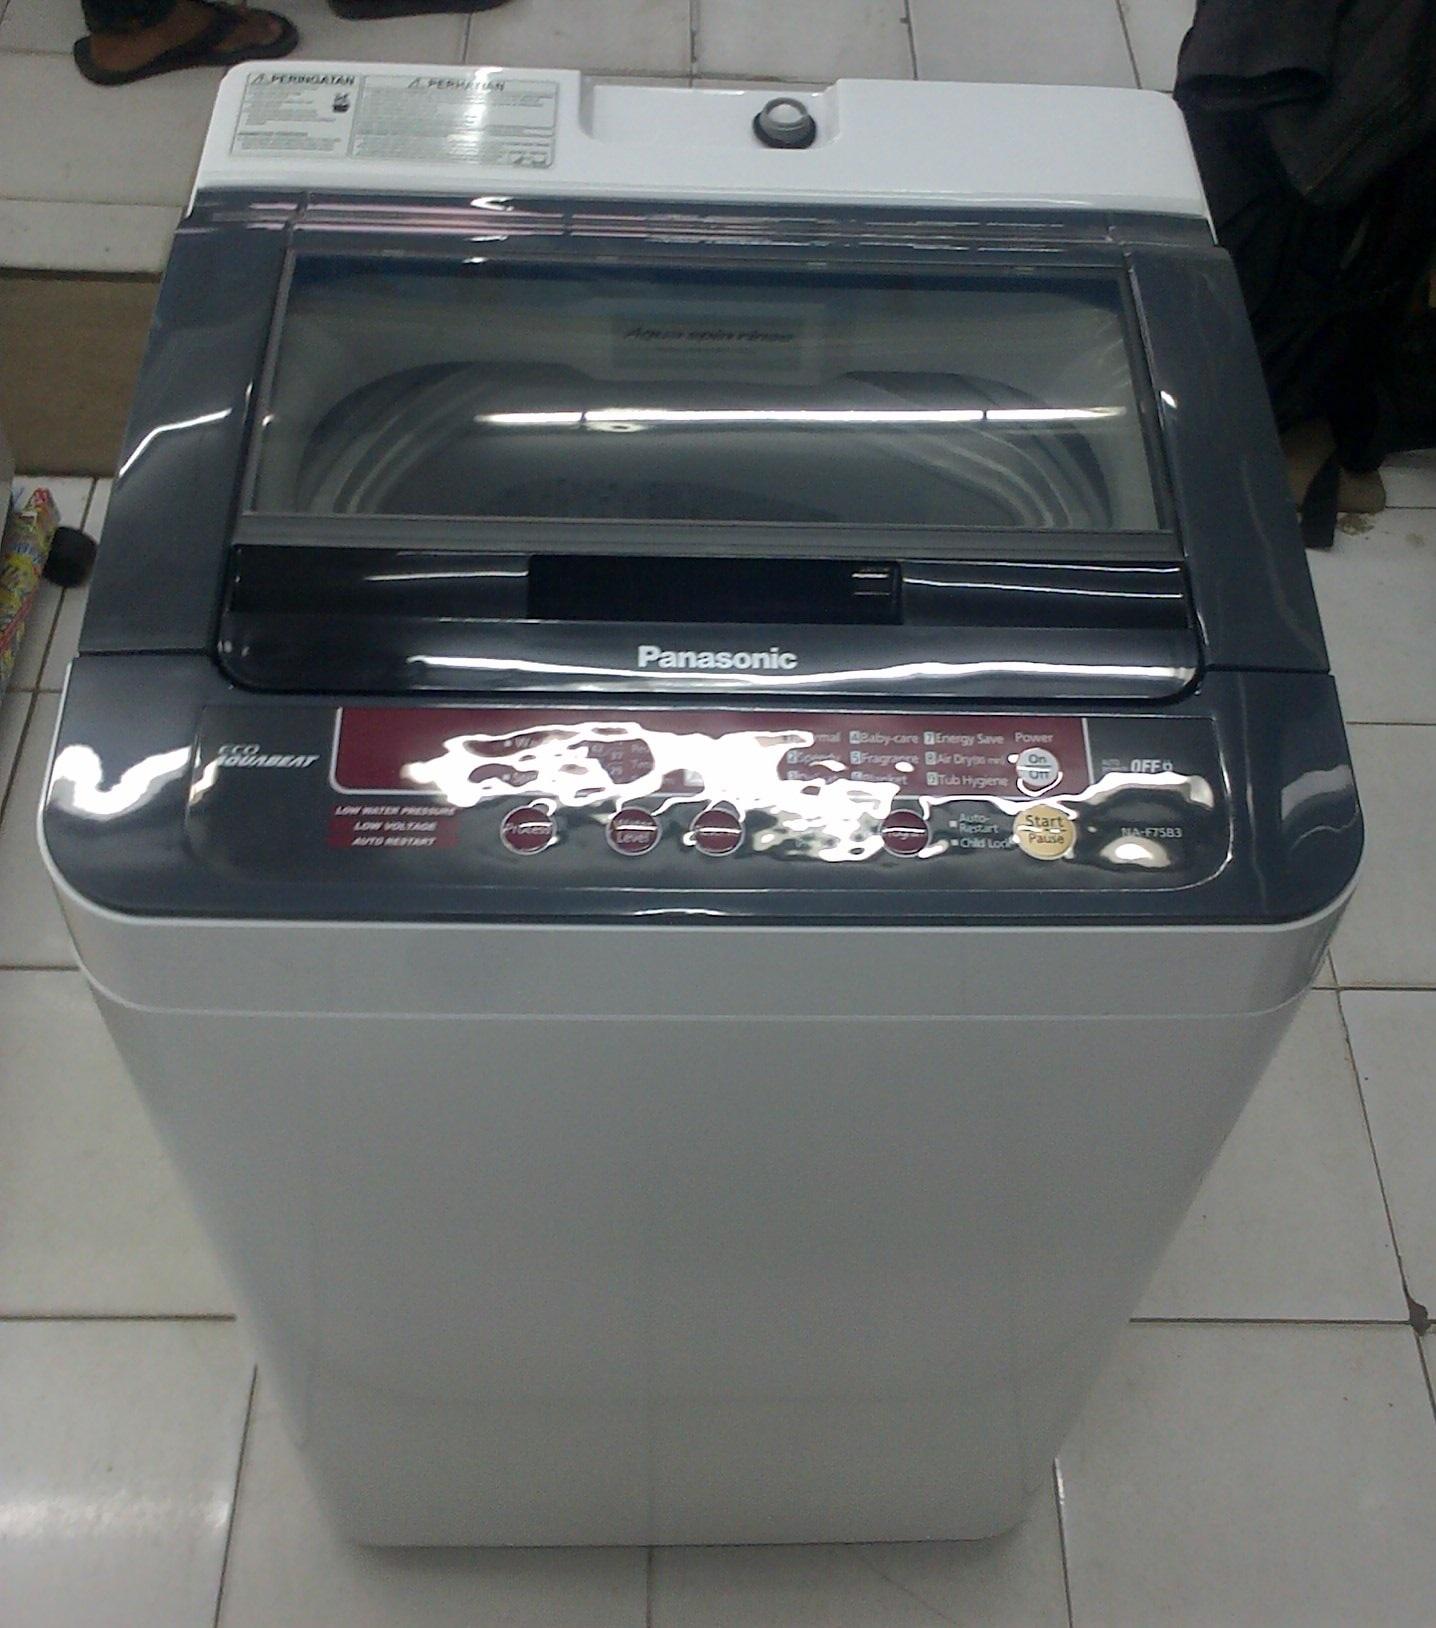 Mesin cuci lg 1 tabung toko elektronik glodok setia mandiri - Jual Panasonic Mesin Cuci 1 Tabung Seri Na F75 B3